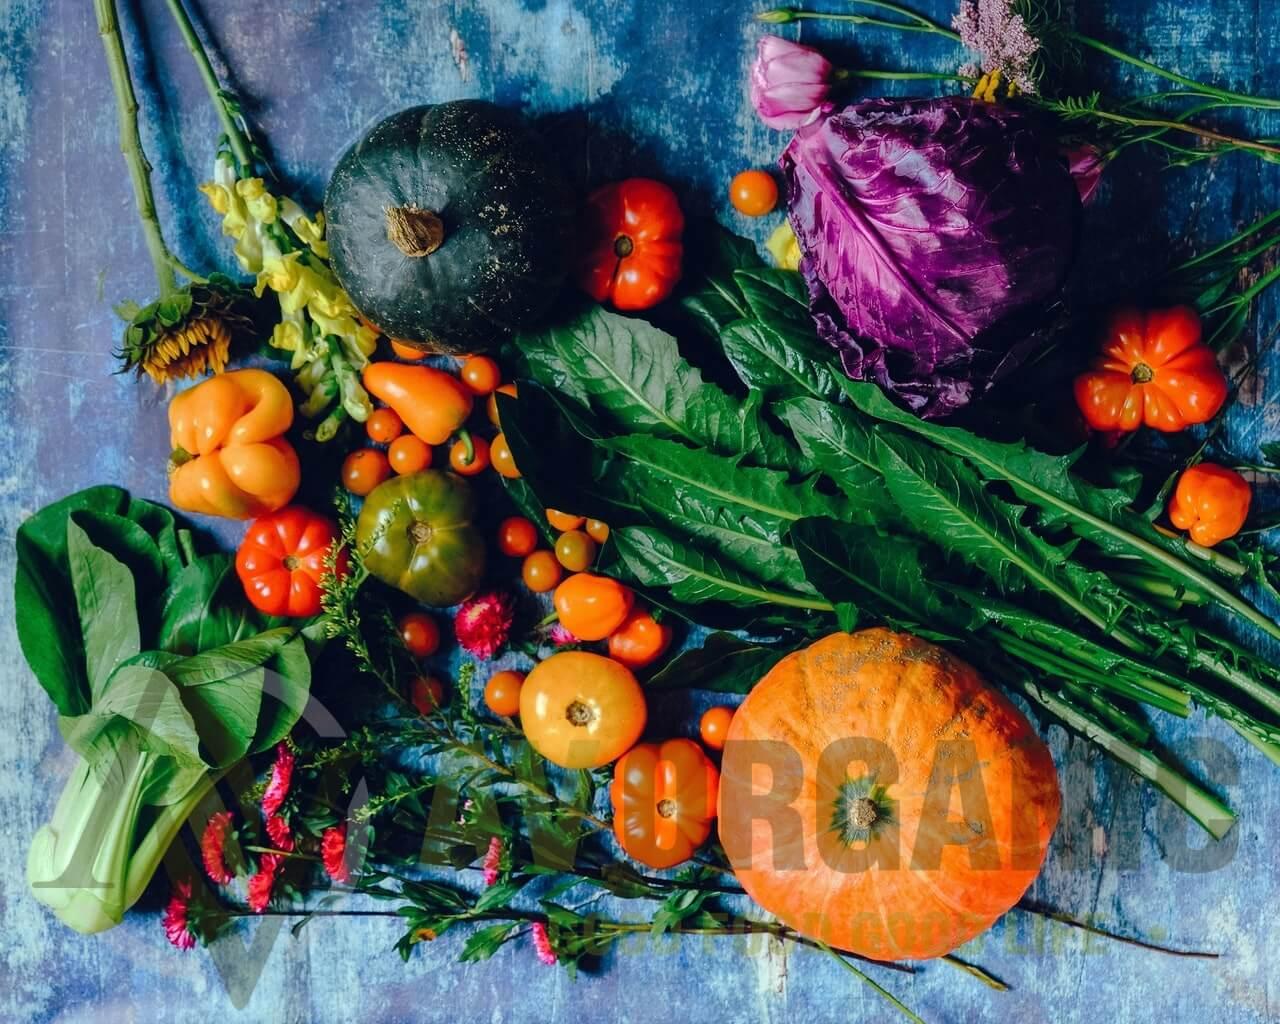 Toko Organik Sehat Alami